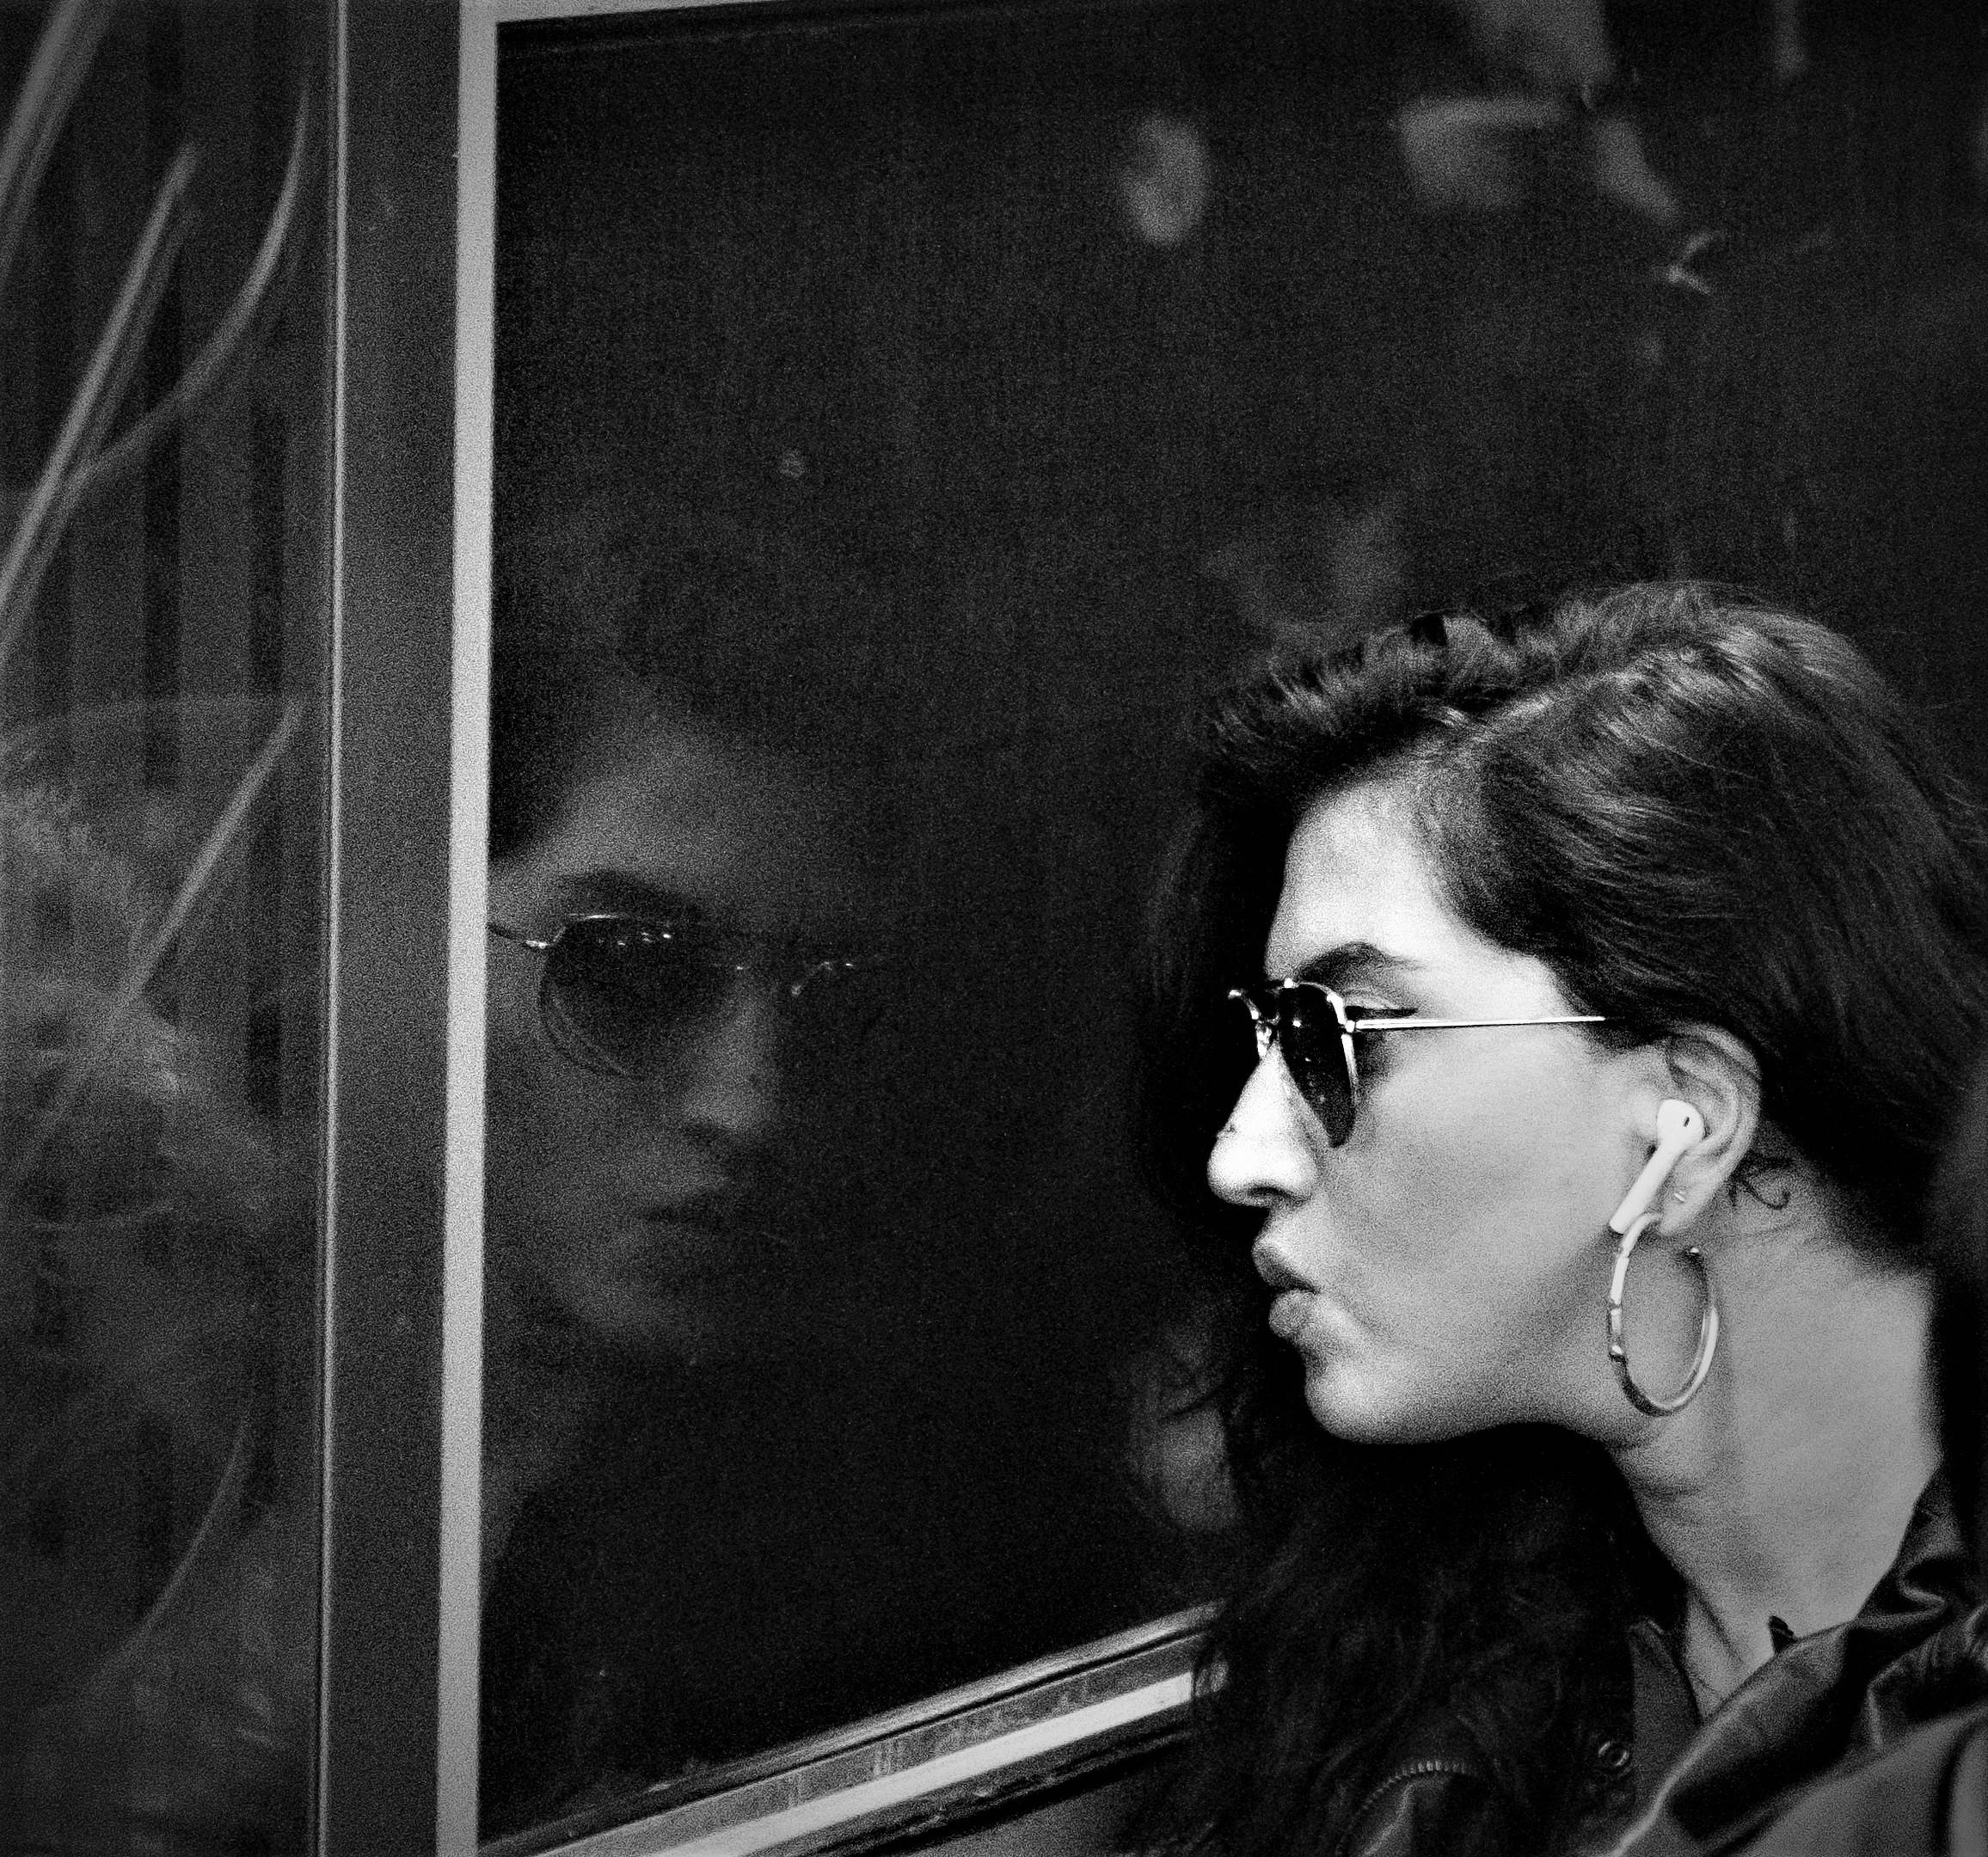 NYC:  Subway Pose